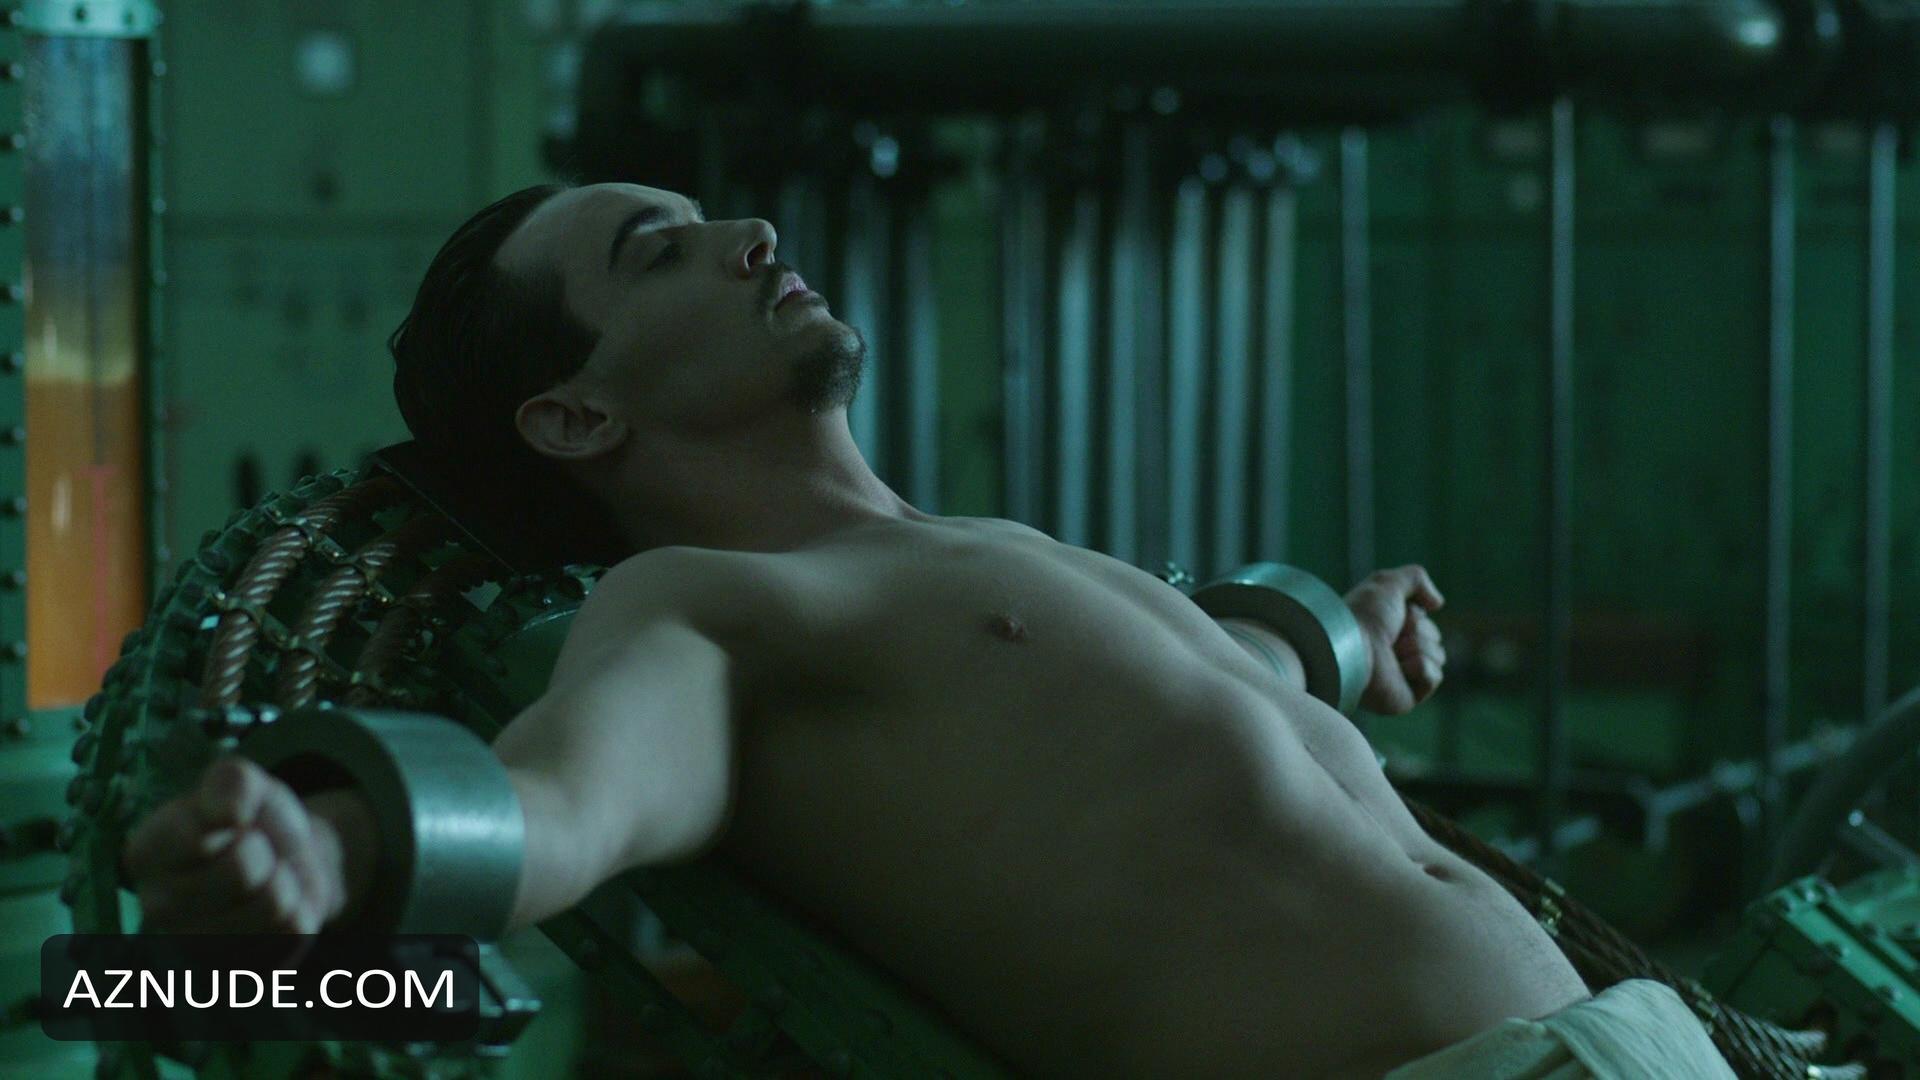 Jonathan rhys meyers signed hot shirtless photo gay